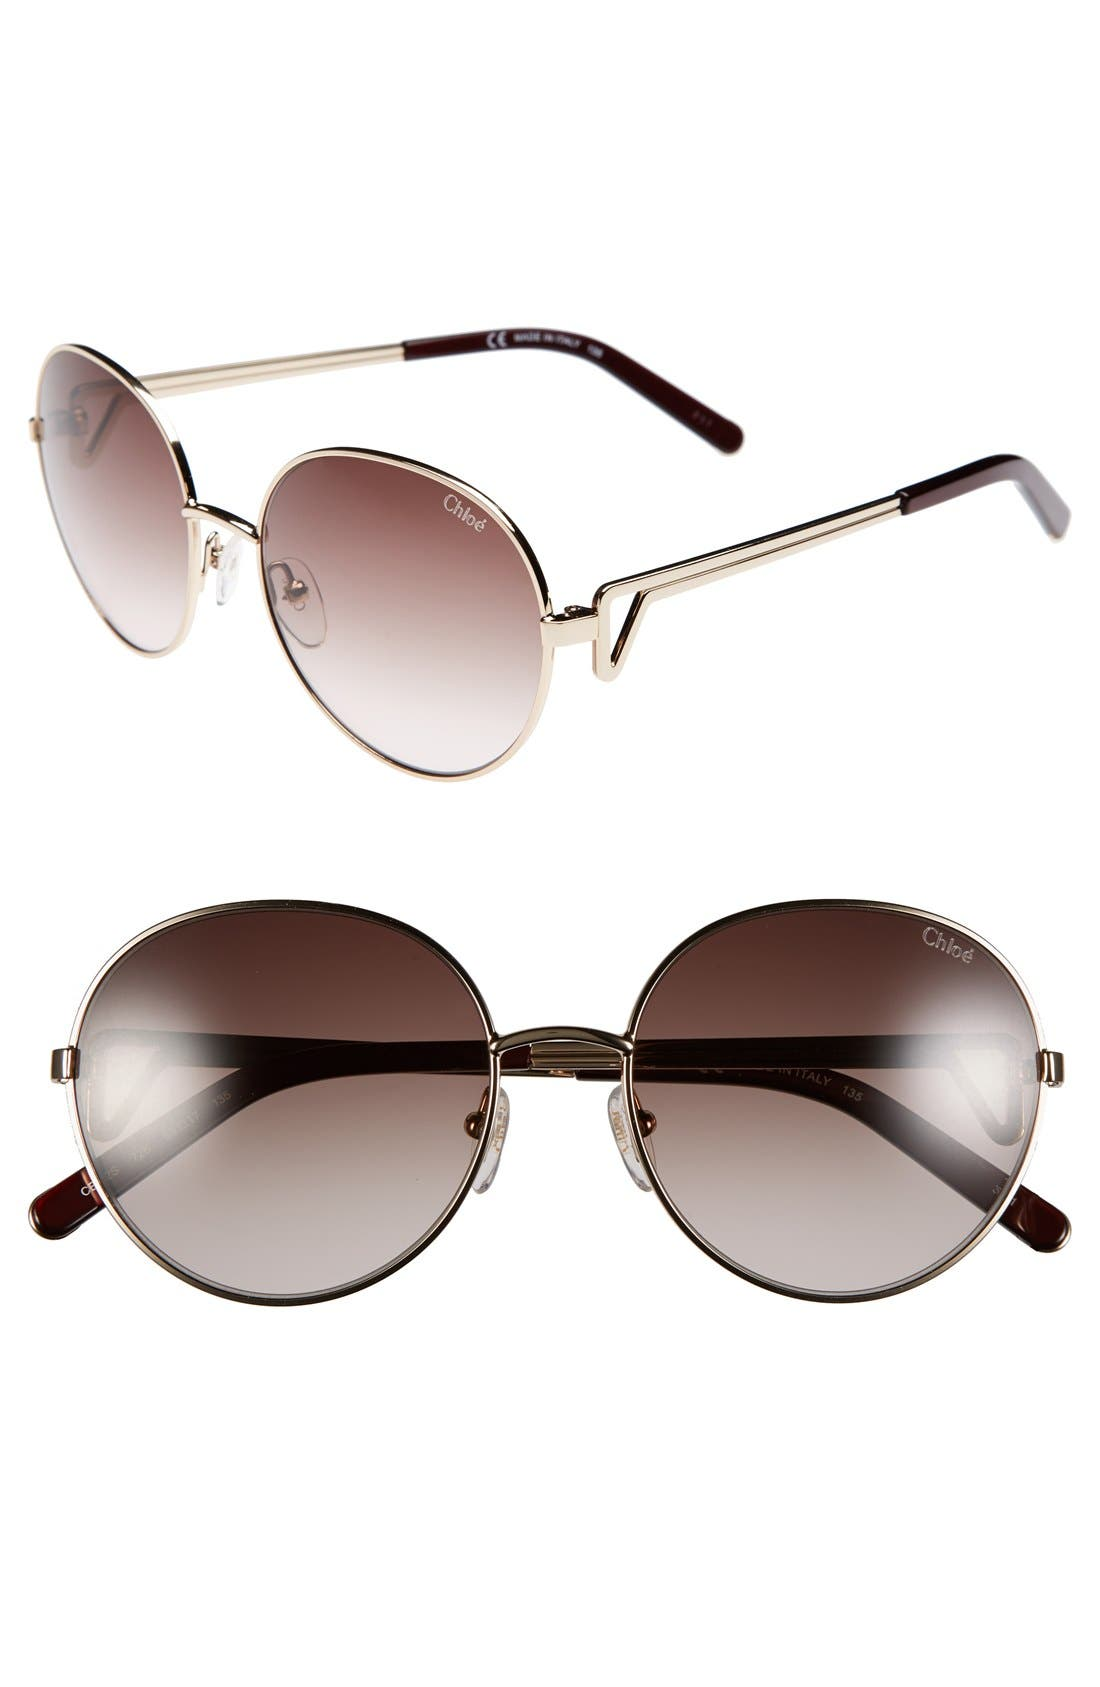 Main Image - Chloé 55mm Oval Sunglasses